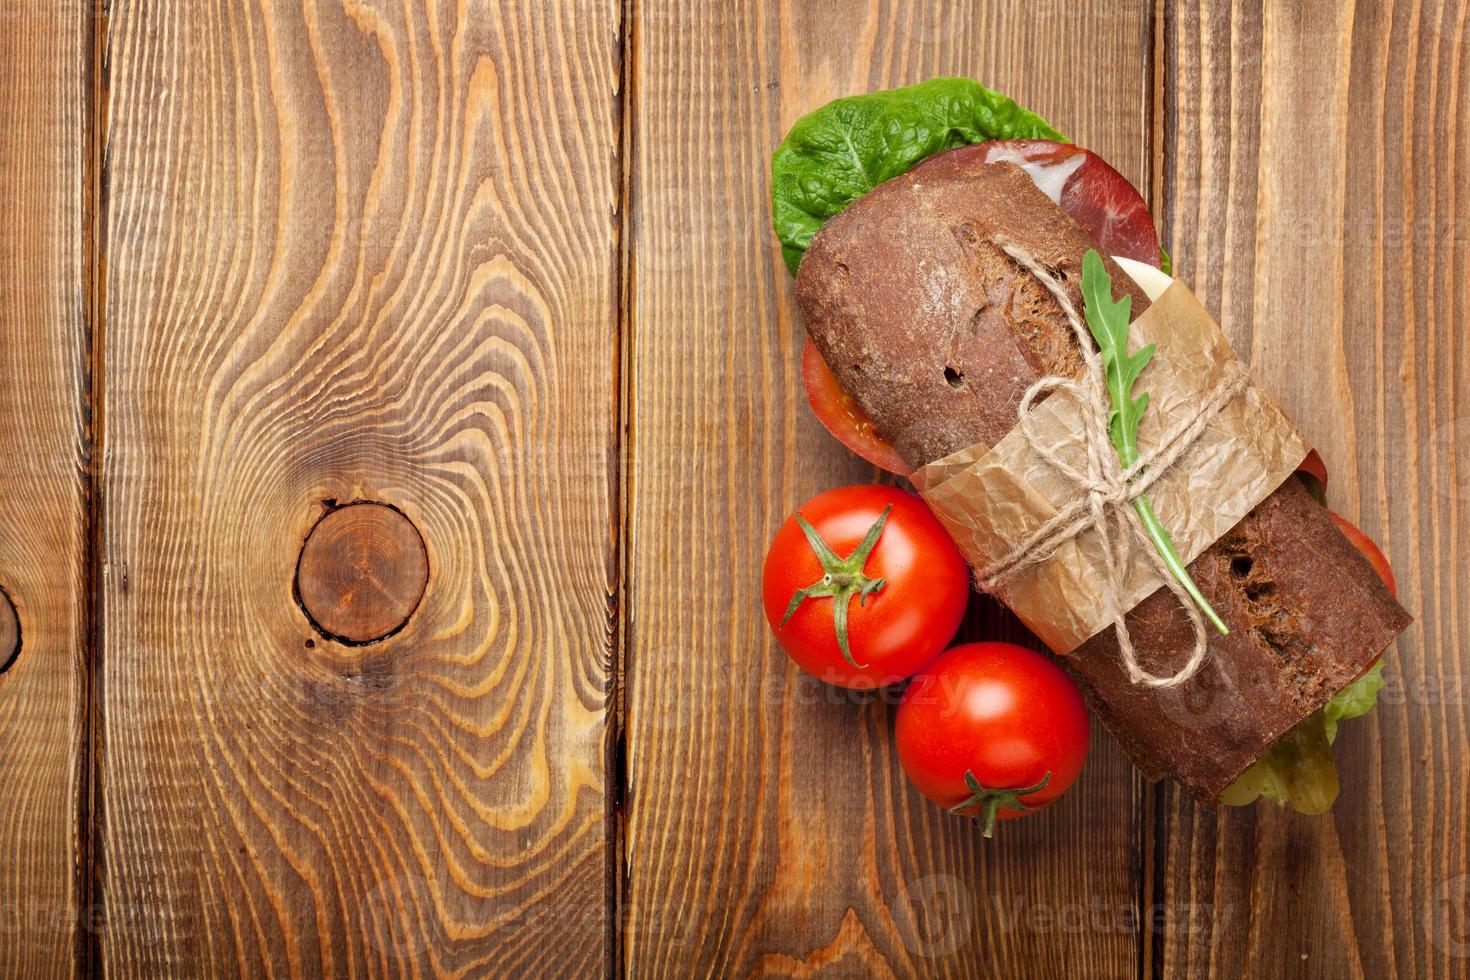 sanduíche com salada, presunto, queijo e tomate foto